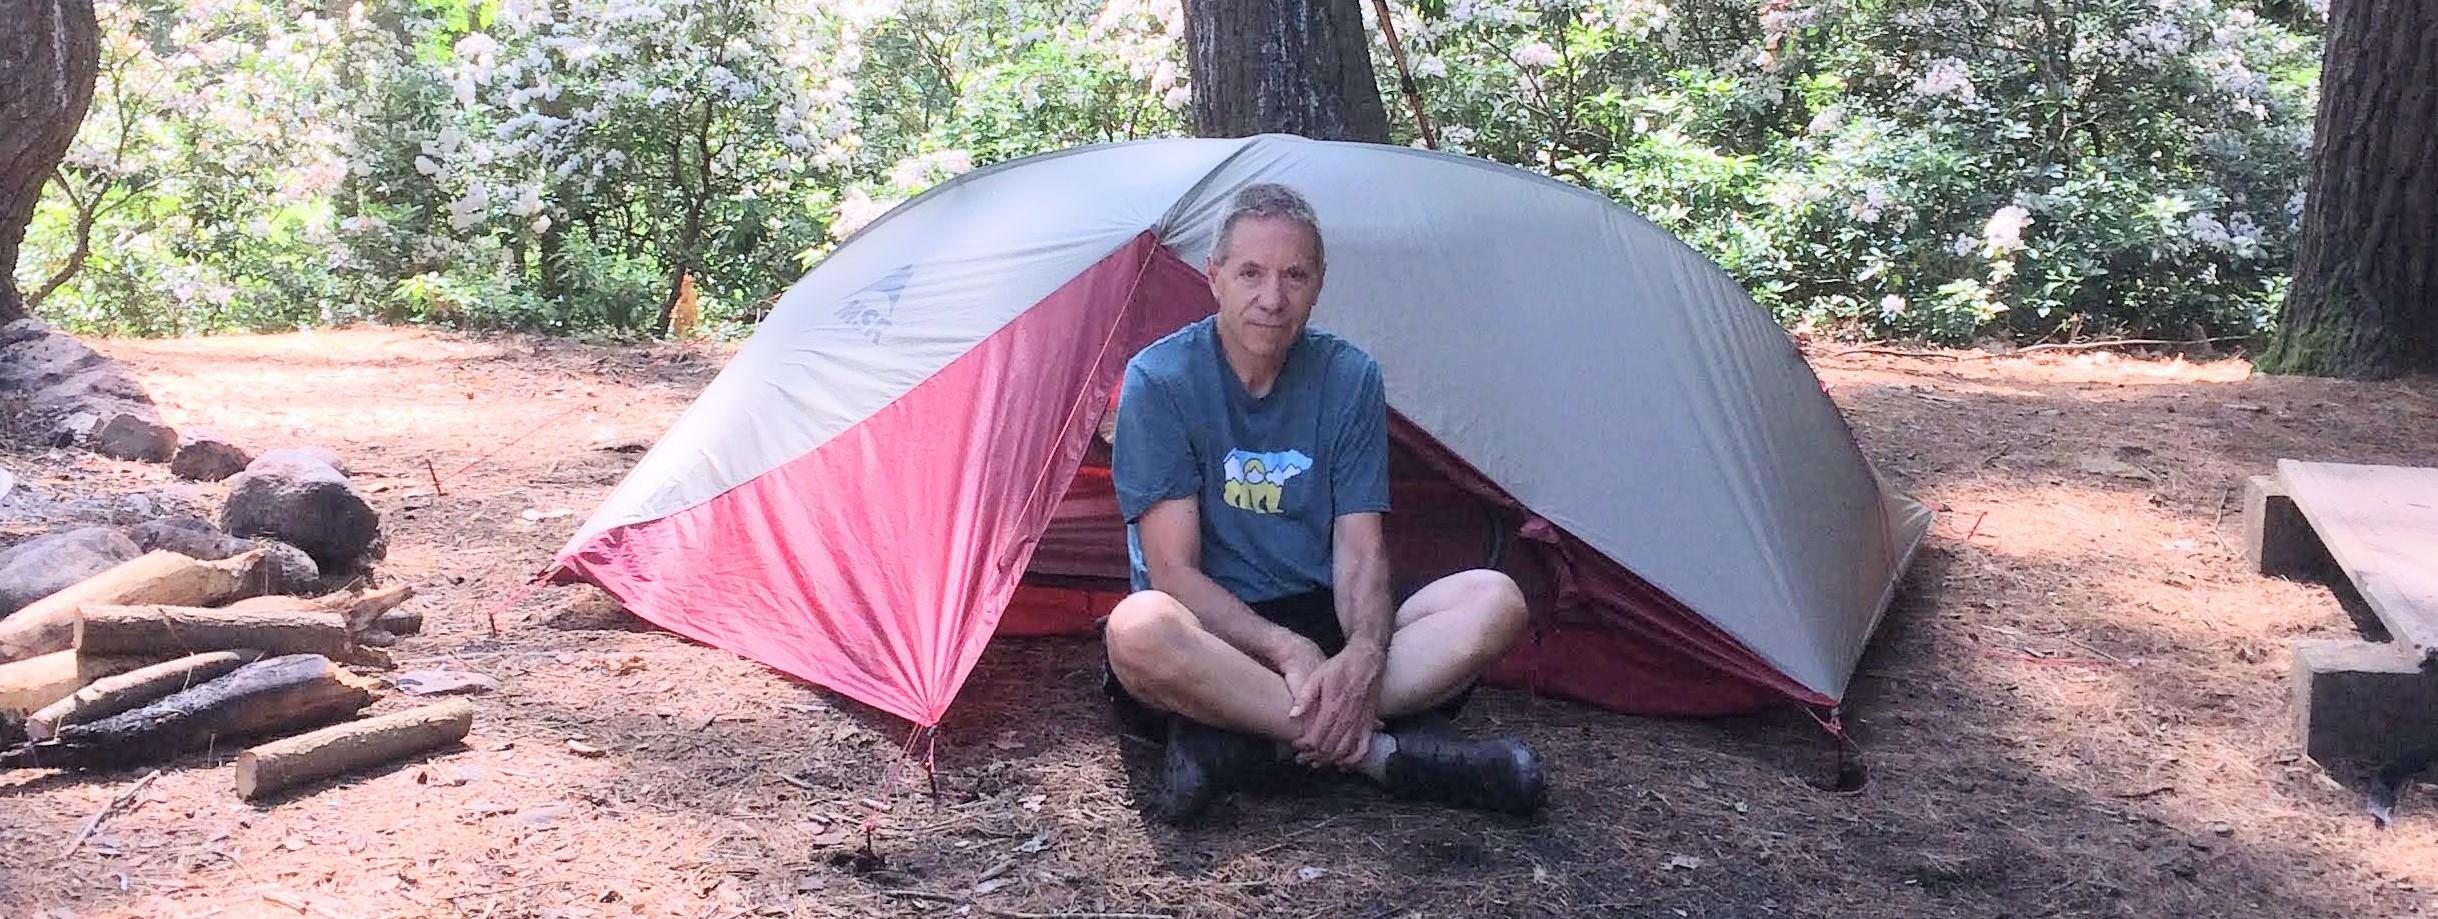 Gear Review: MSR Carbon Reflex 2 Tent - The Trek